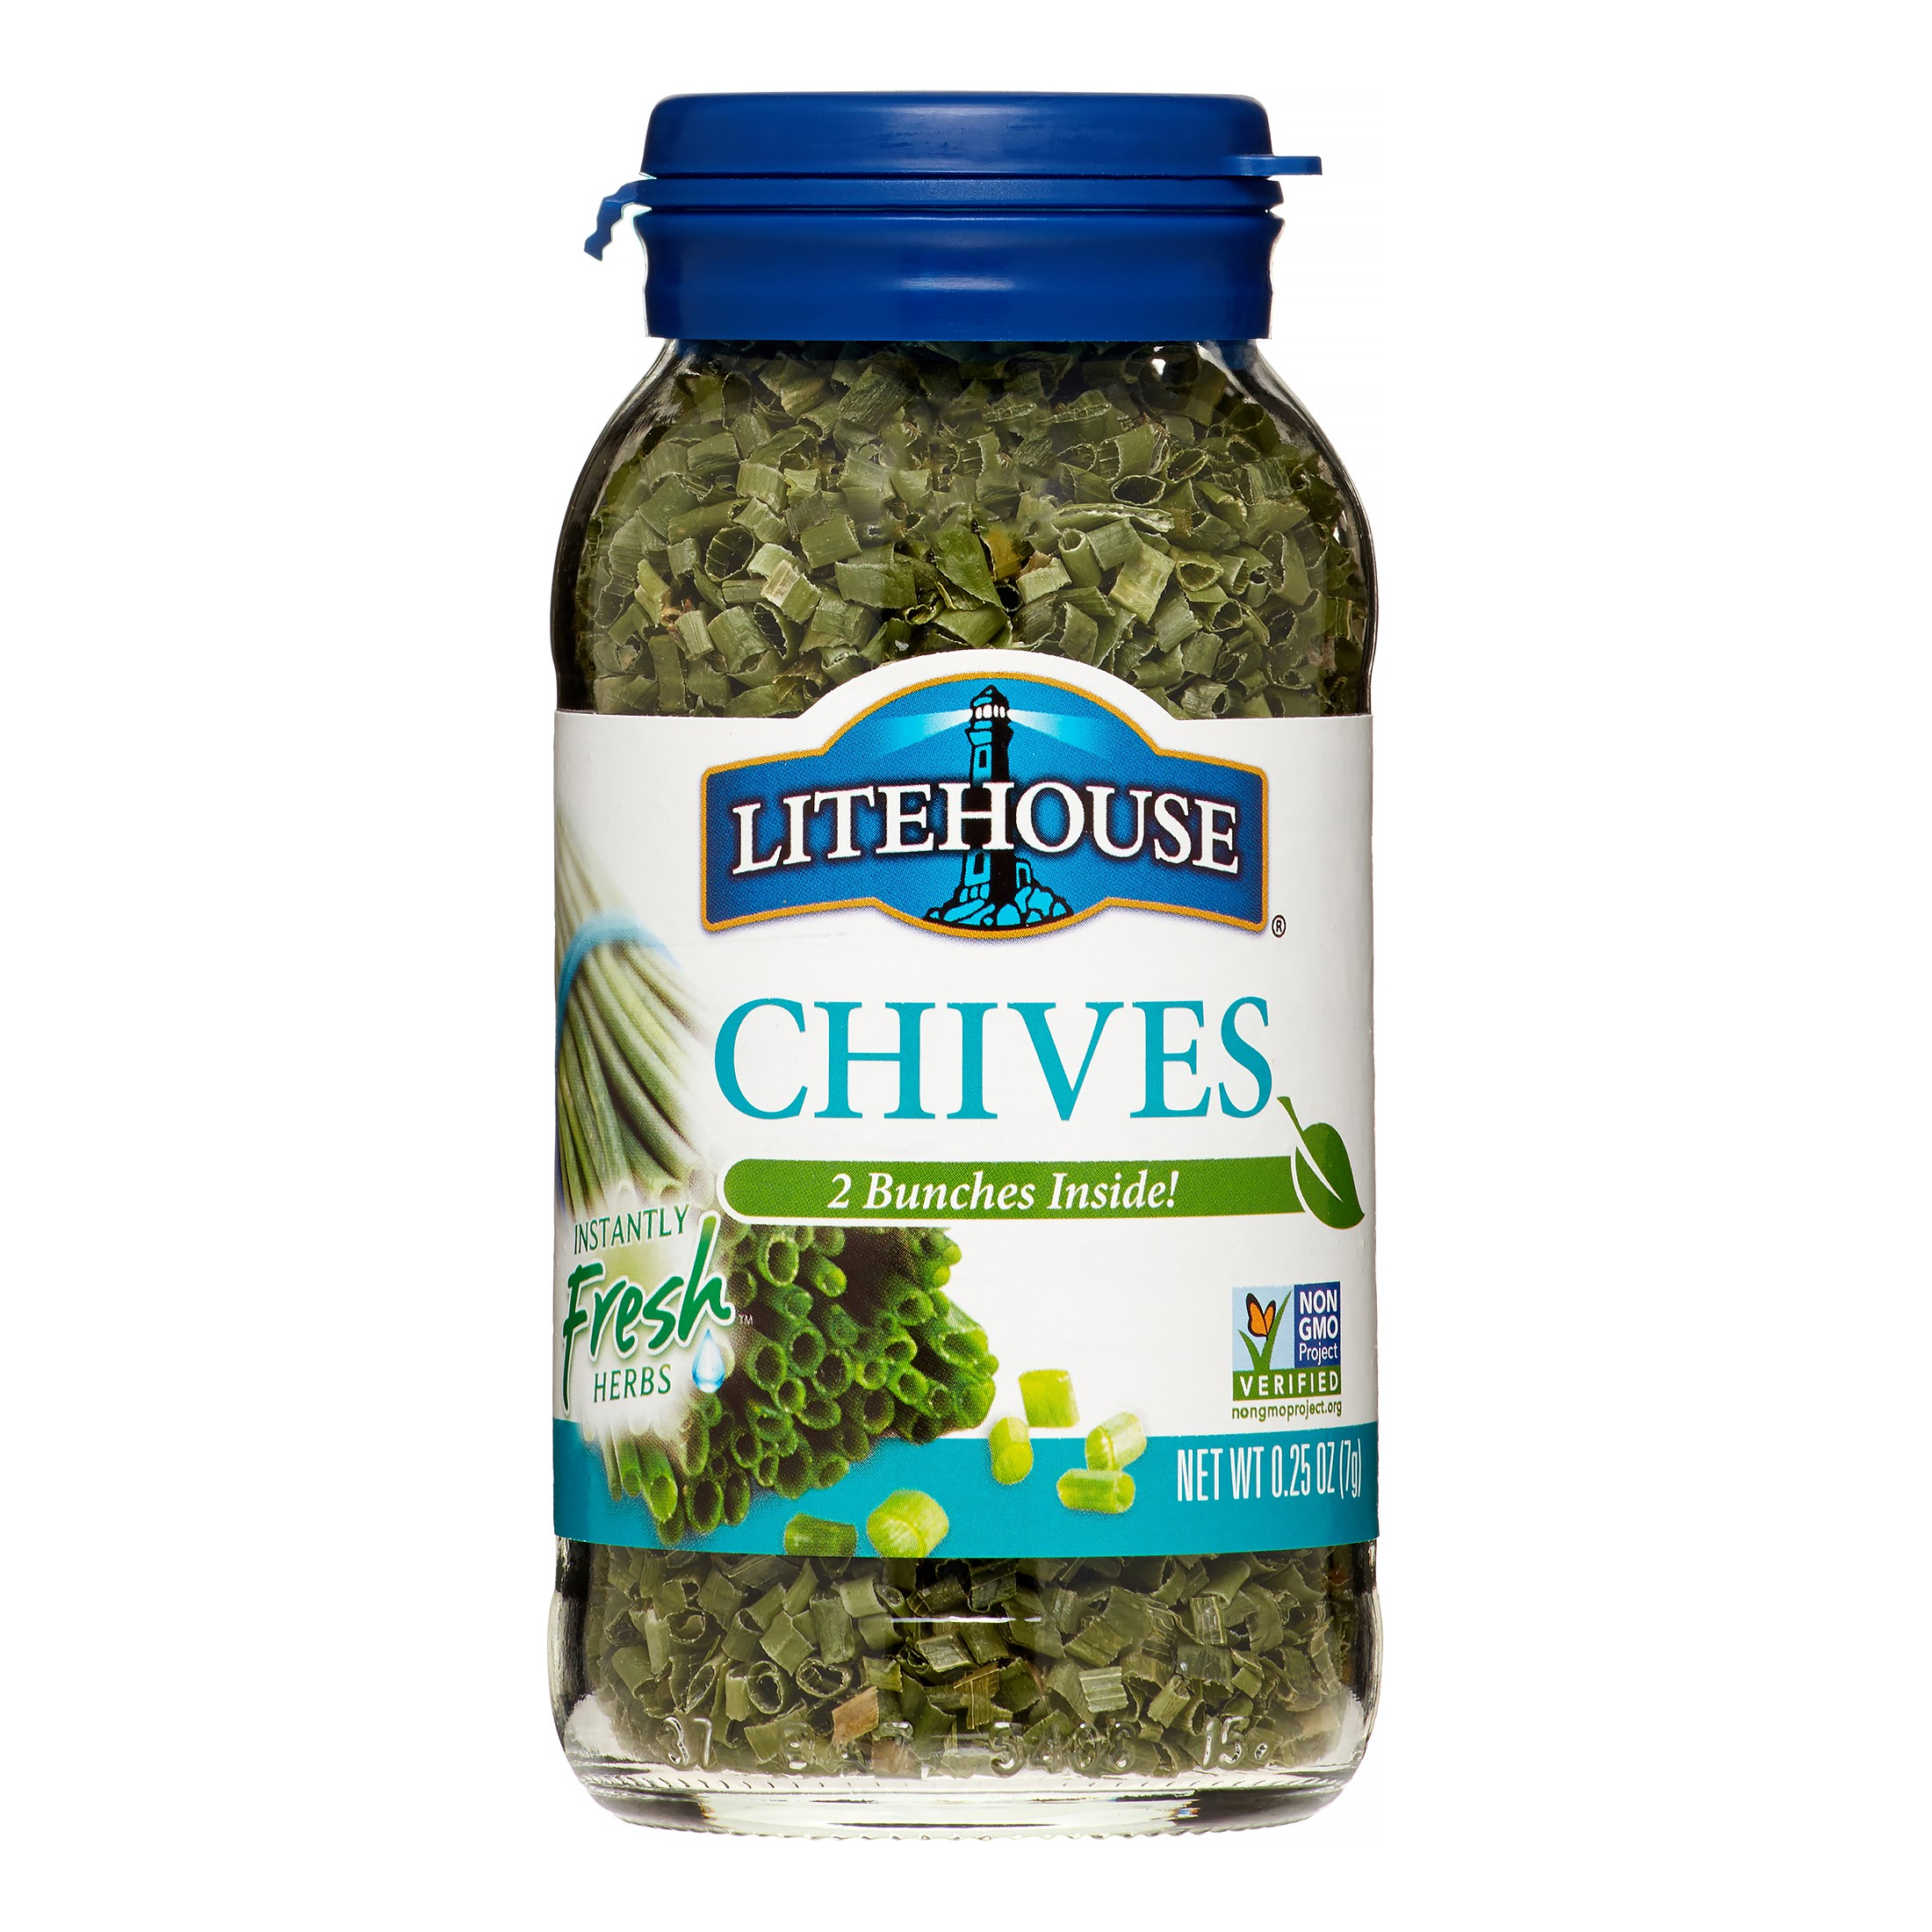 Litehouse Chives Herbs, 0.25 Oz